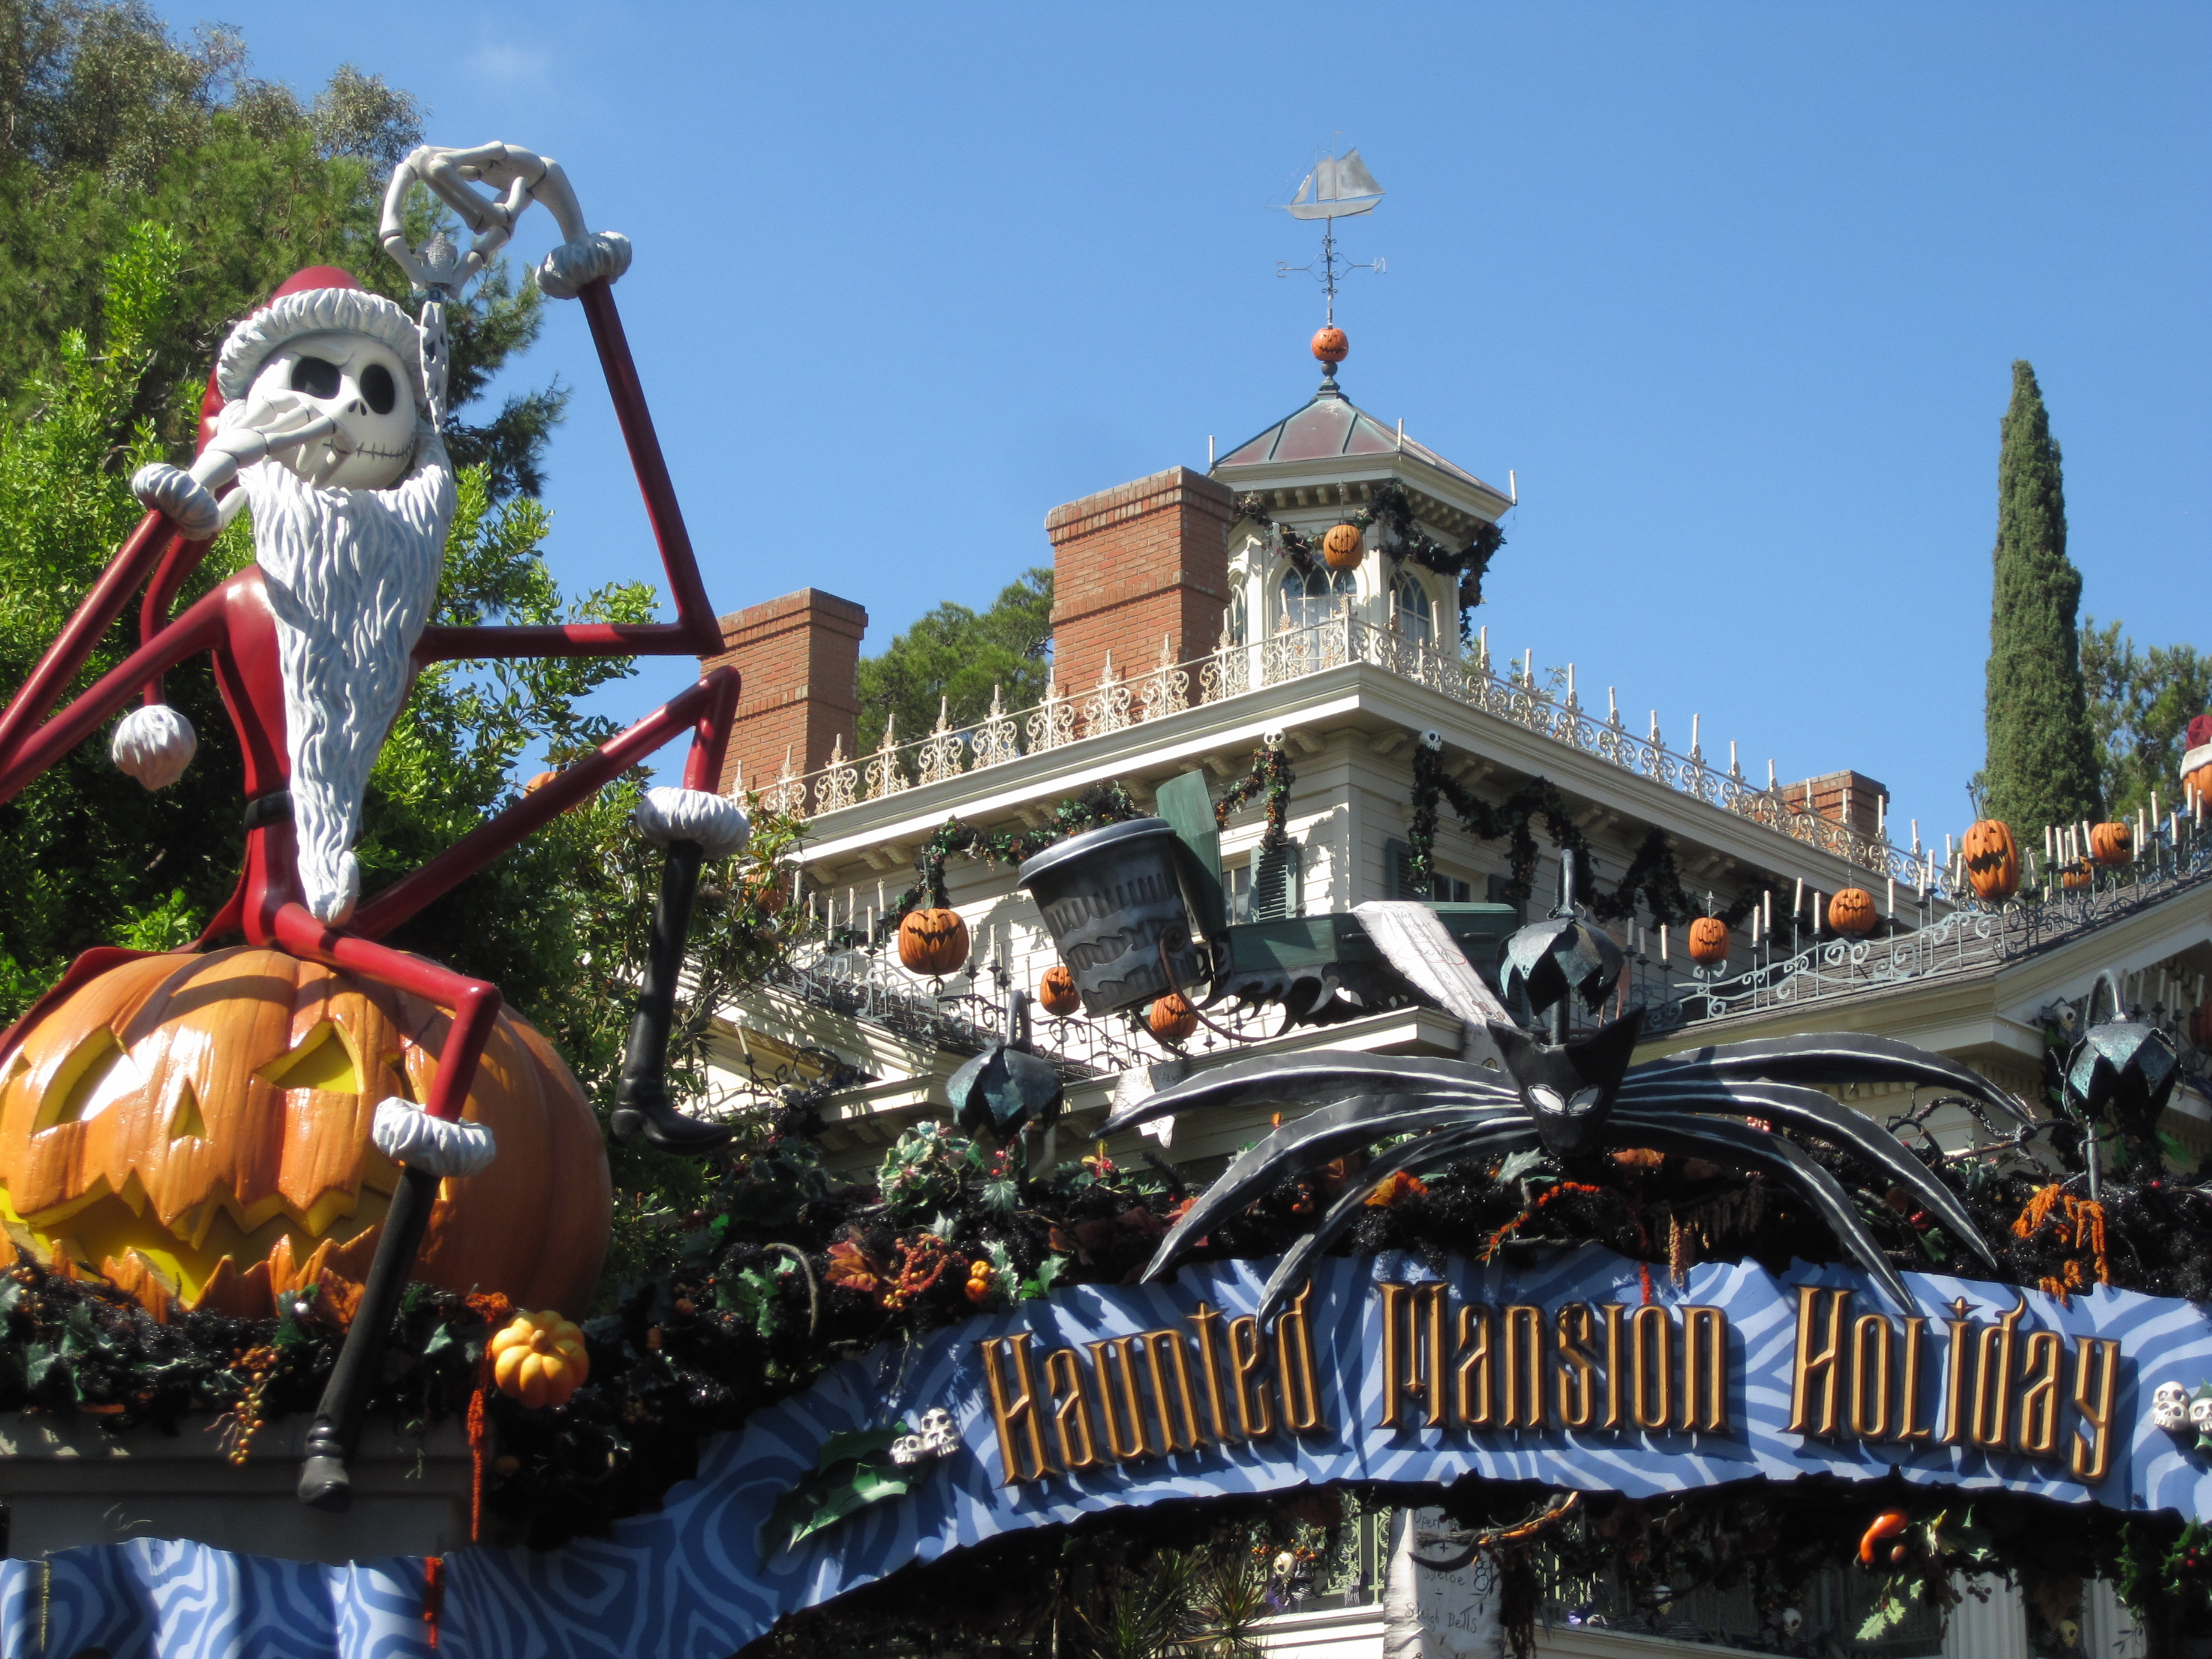 House of Nightmares Haunted House Haunted House Nightmare